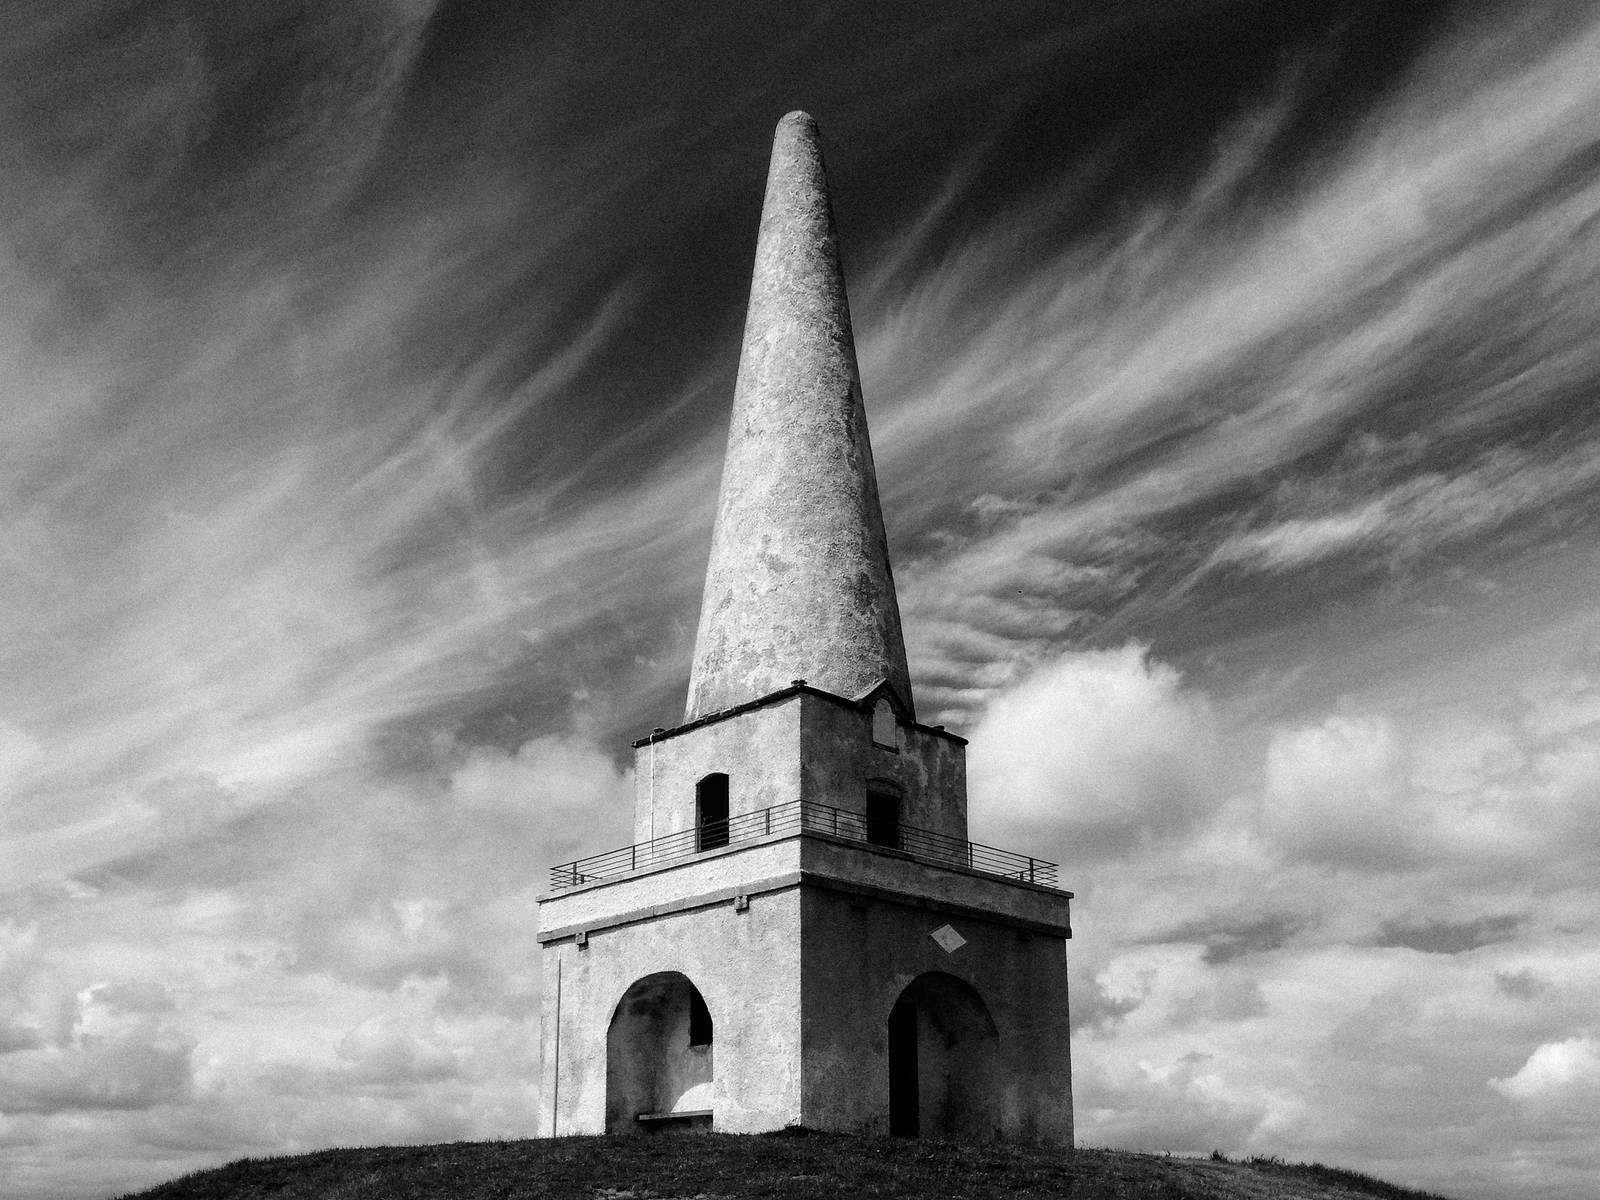 Killiney Hill obelisk